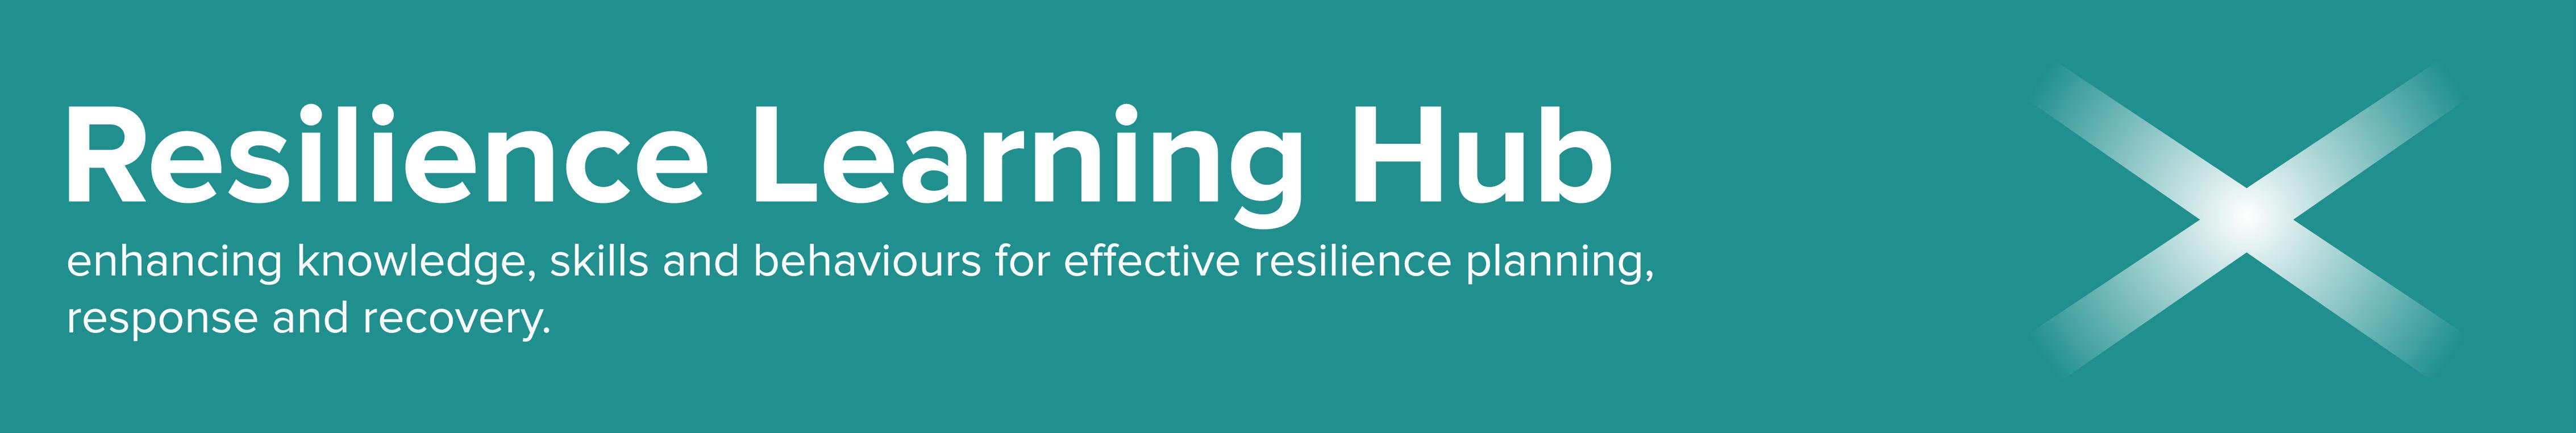 Resilience Hub logo